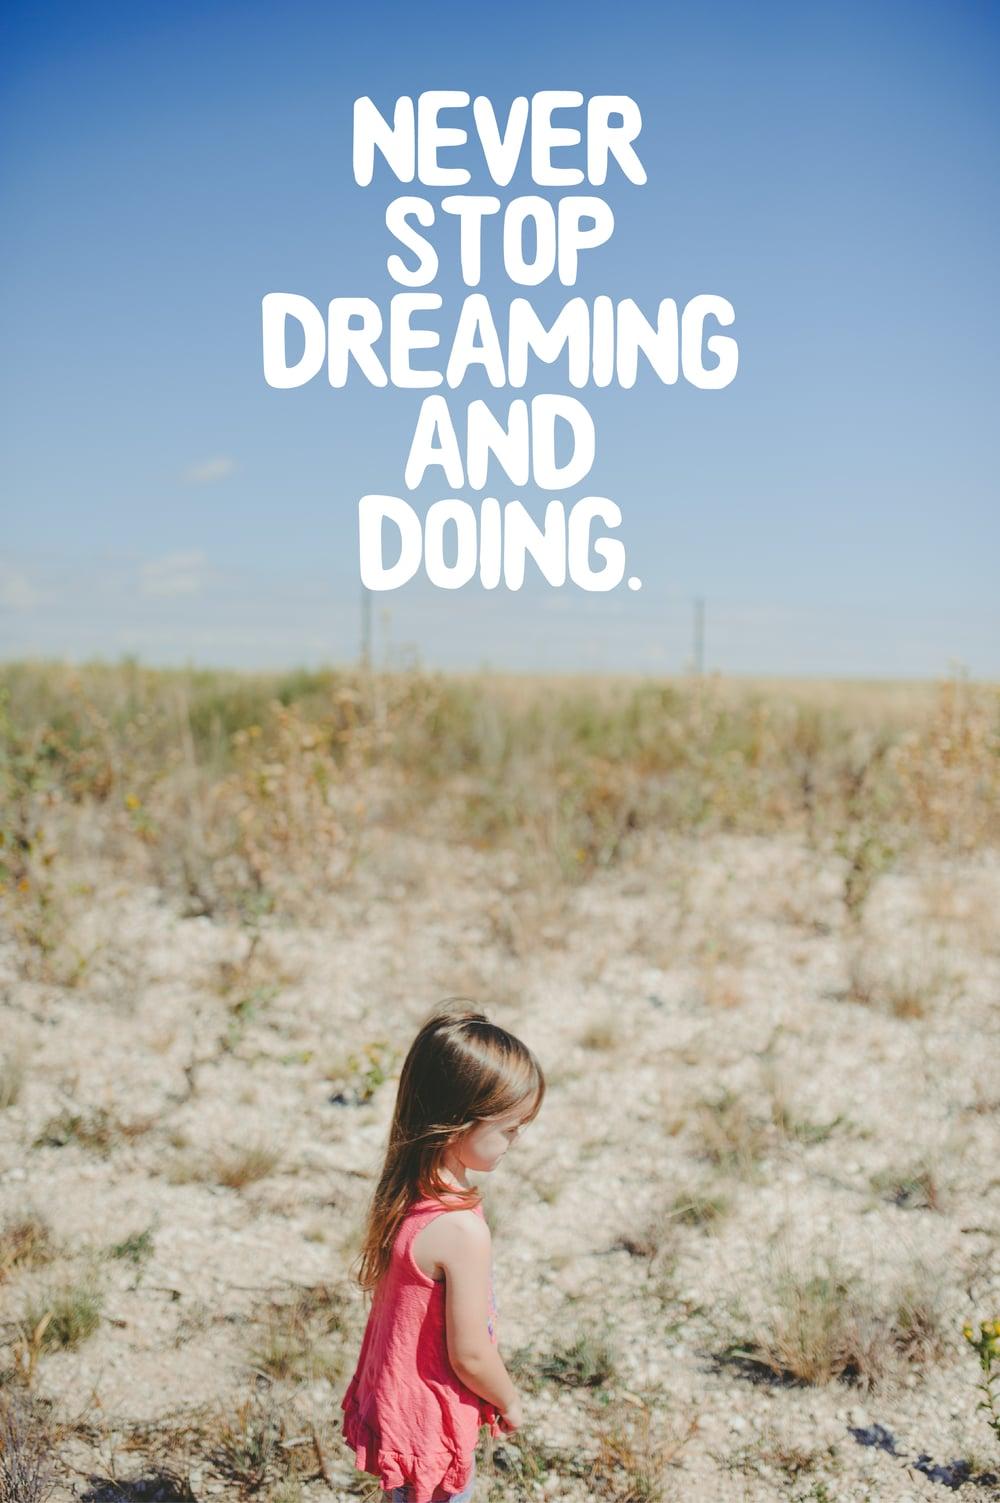 dream on // little h creative // blog // new year